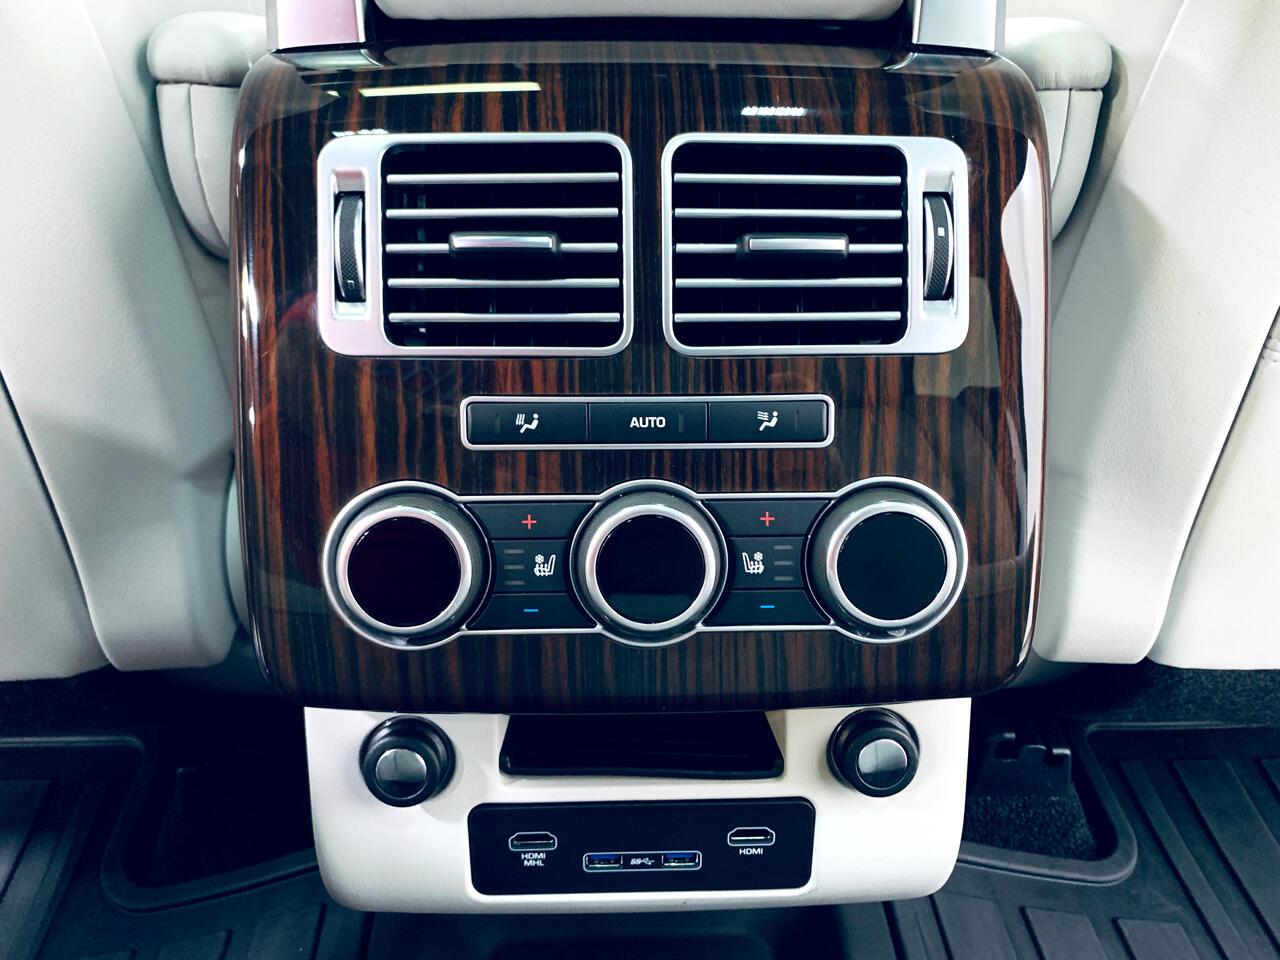 Land Rover Range Rover V8 Supercharged SWB 2017